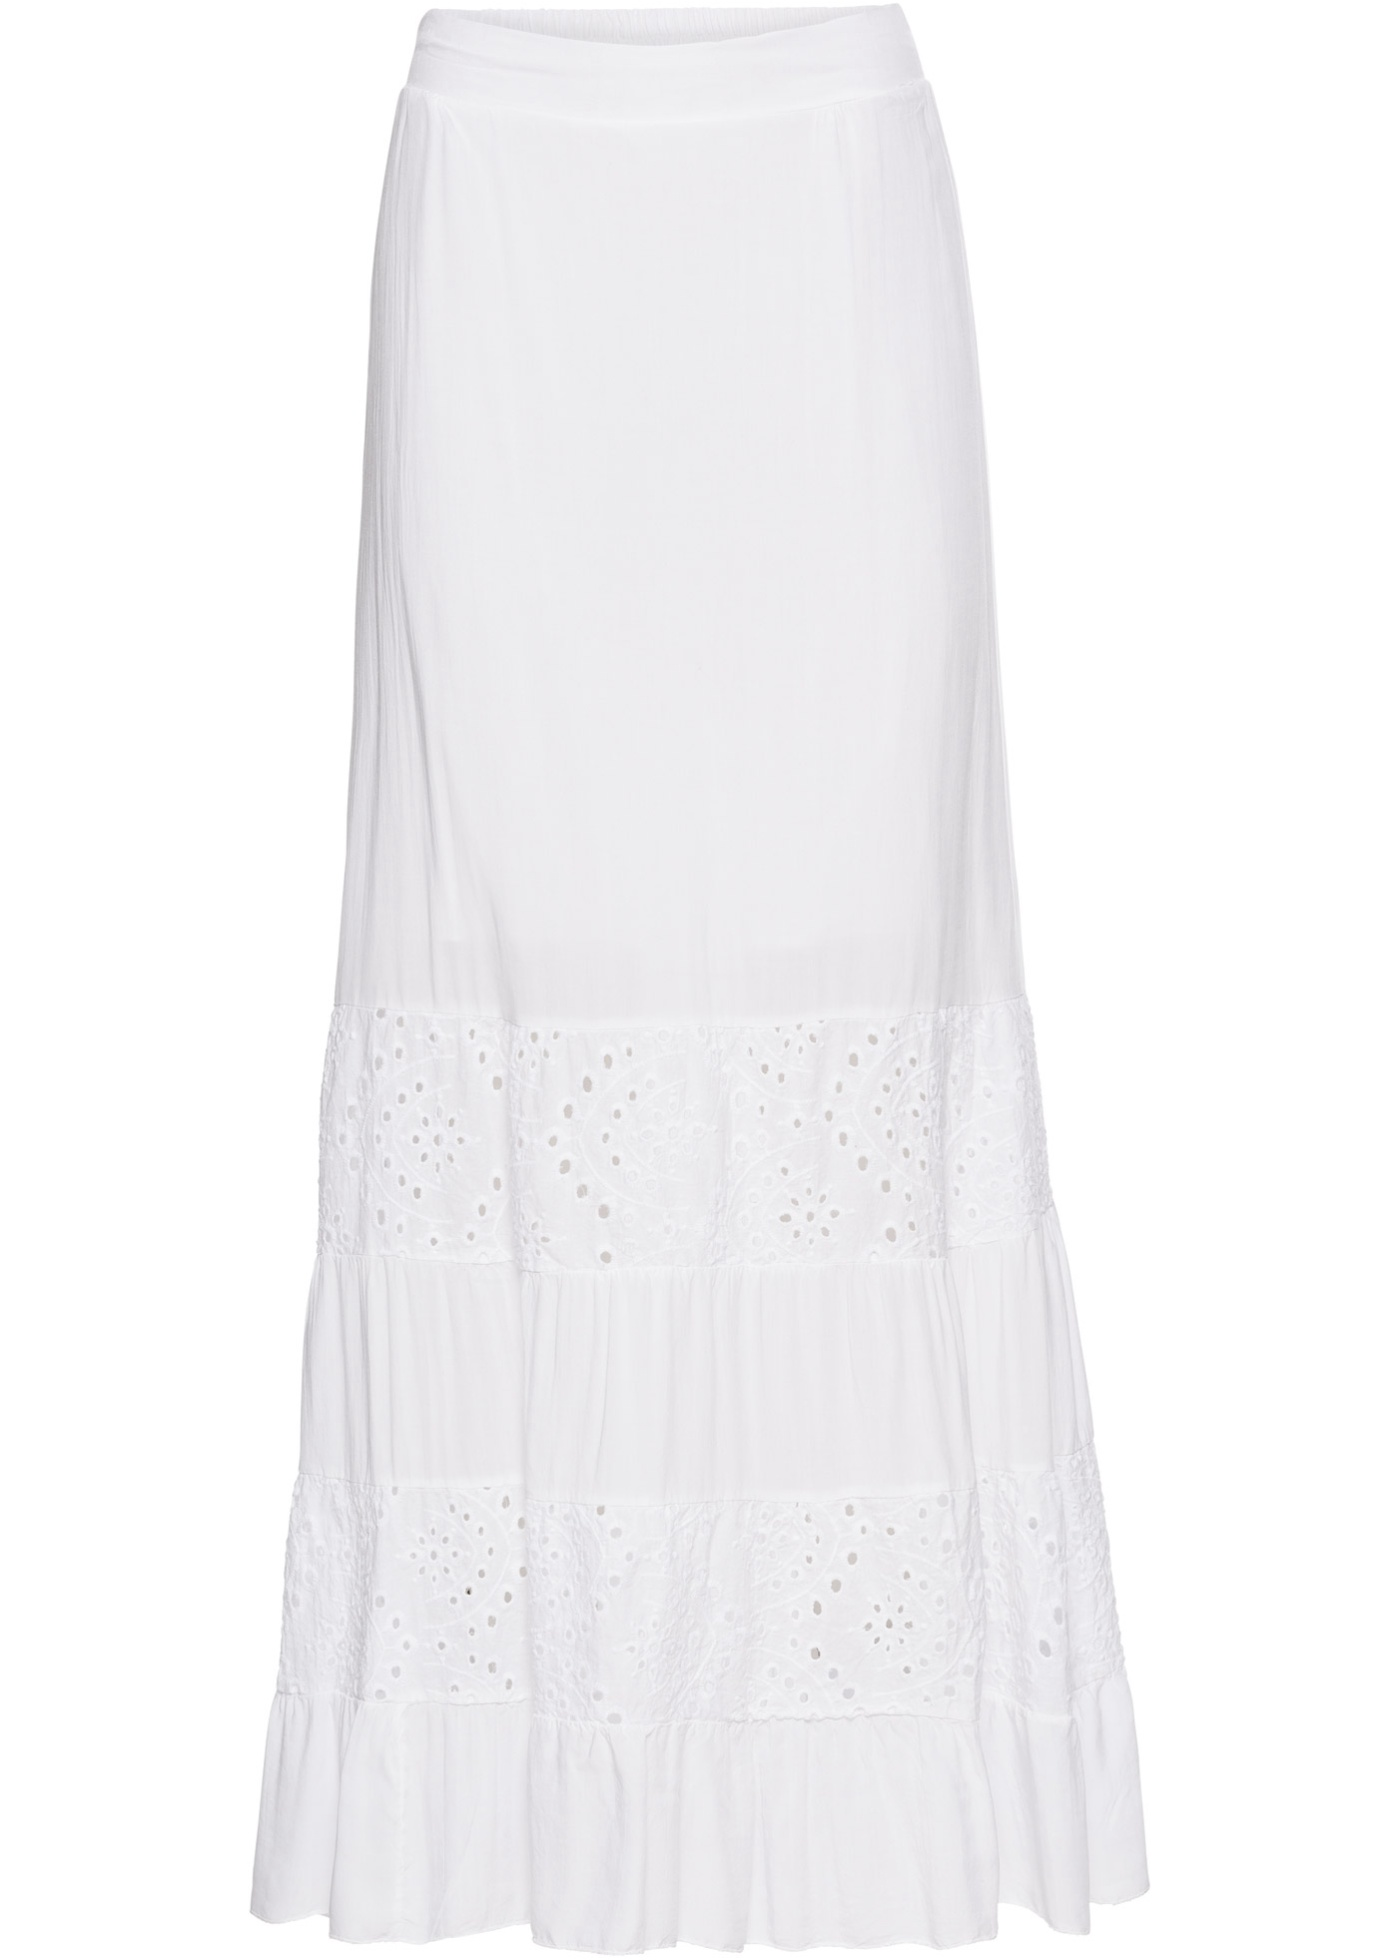 0de16b20720 Dlouhá sukně s krajkovými vsadkami - Bílá